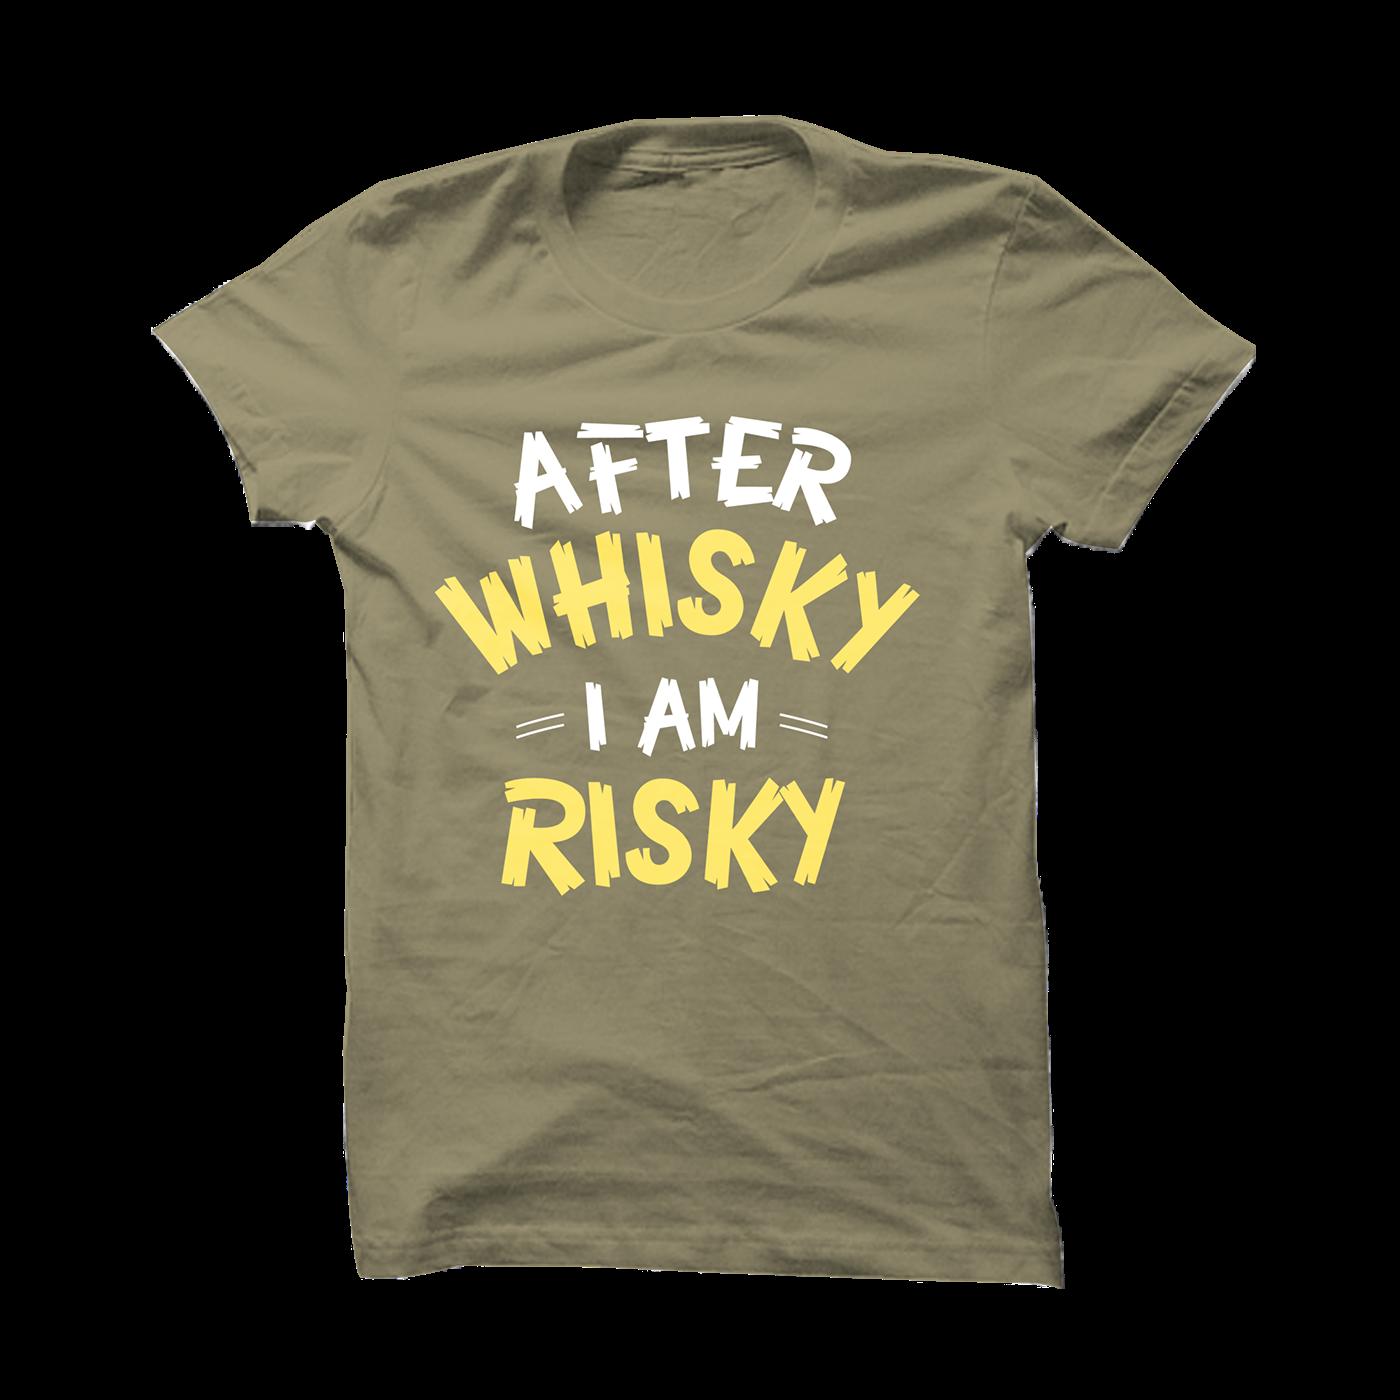 Cool Mens T-Shirt Designs On Behance